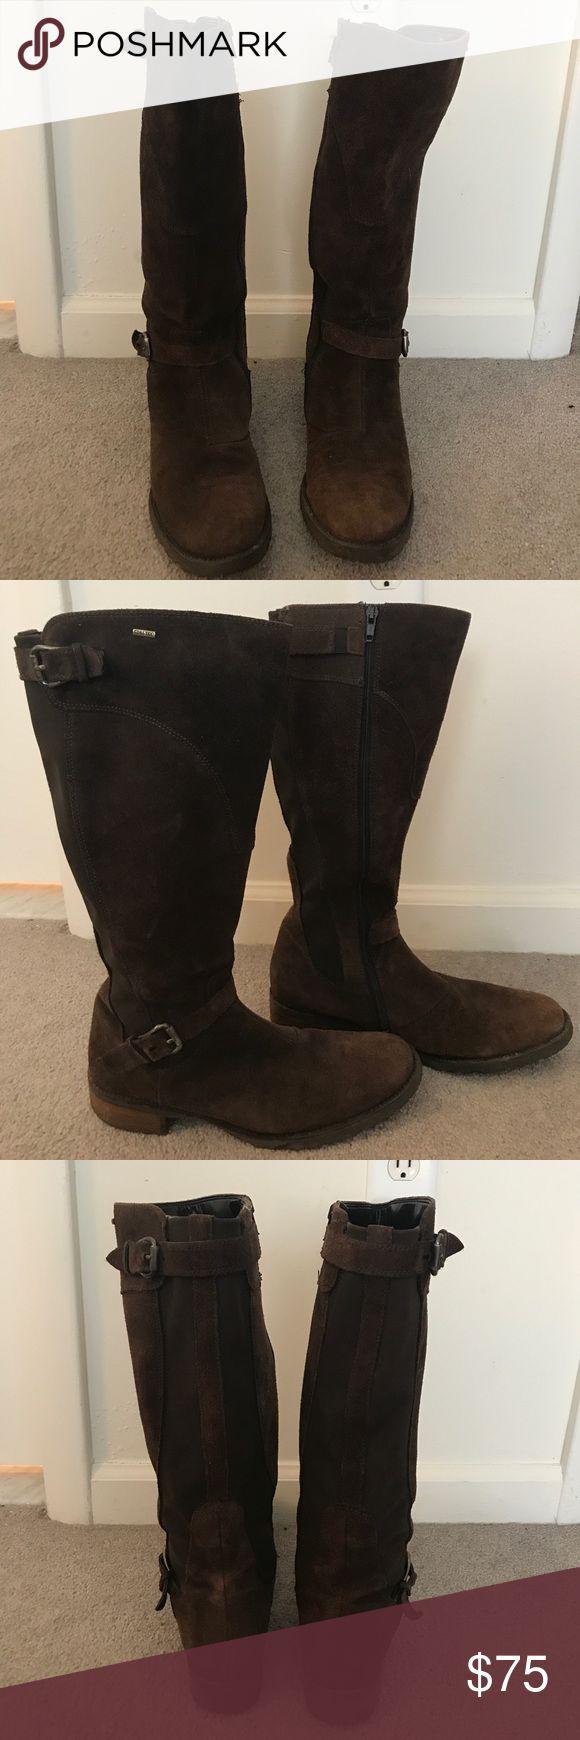 Goretex Waterproof Brown Suede Boots Lightly worn, waterproof, full zipper, very comfortable Shoes Winter & Rain Boots